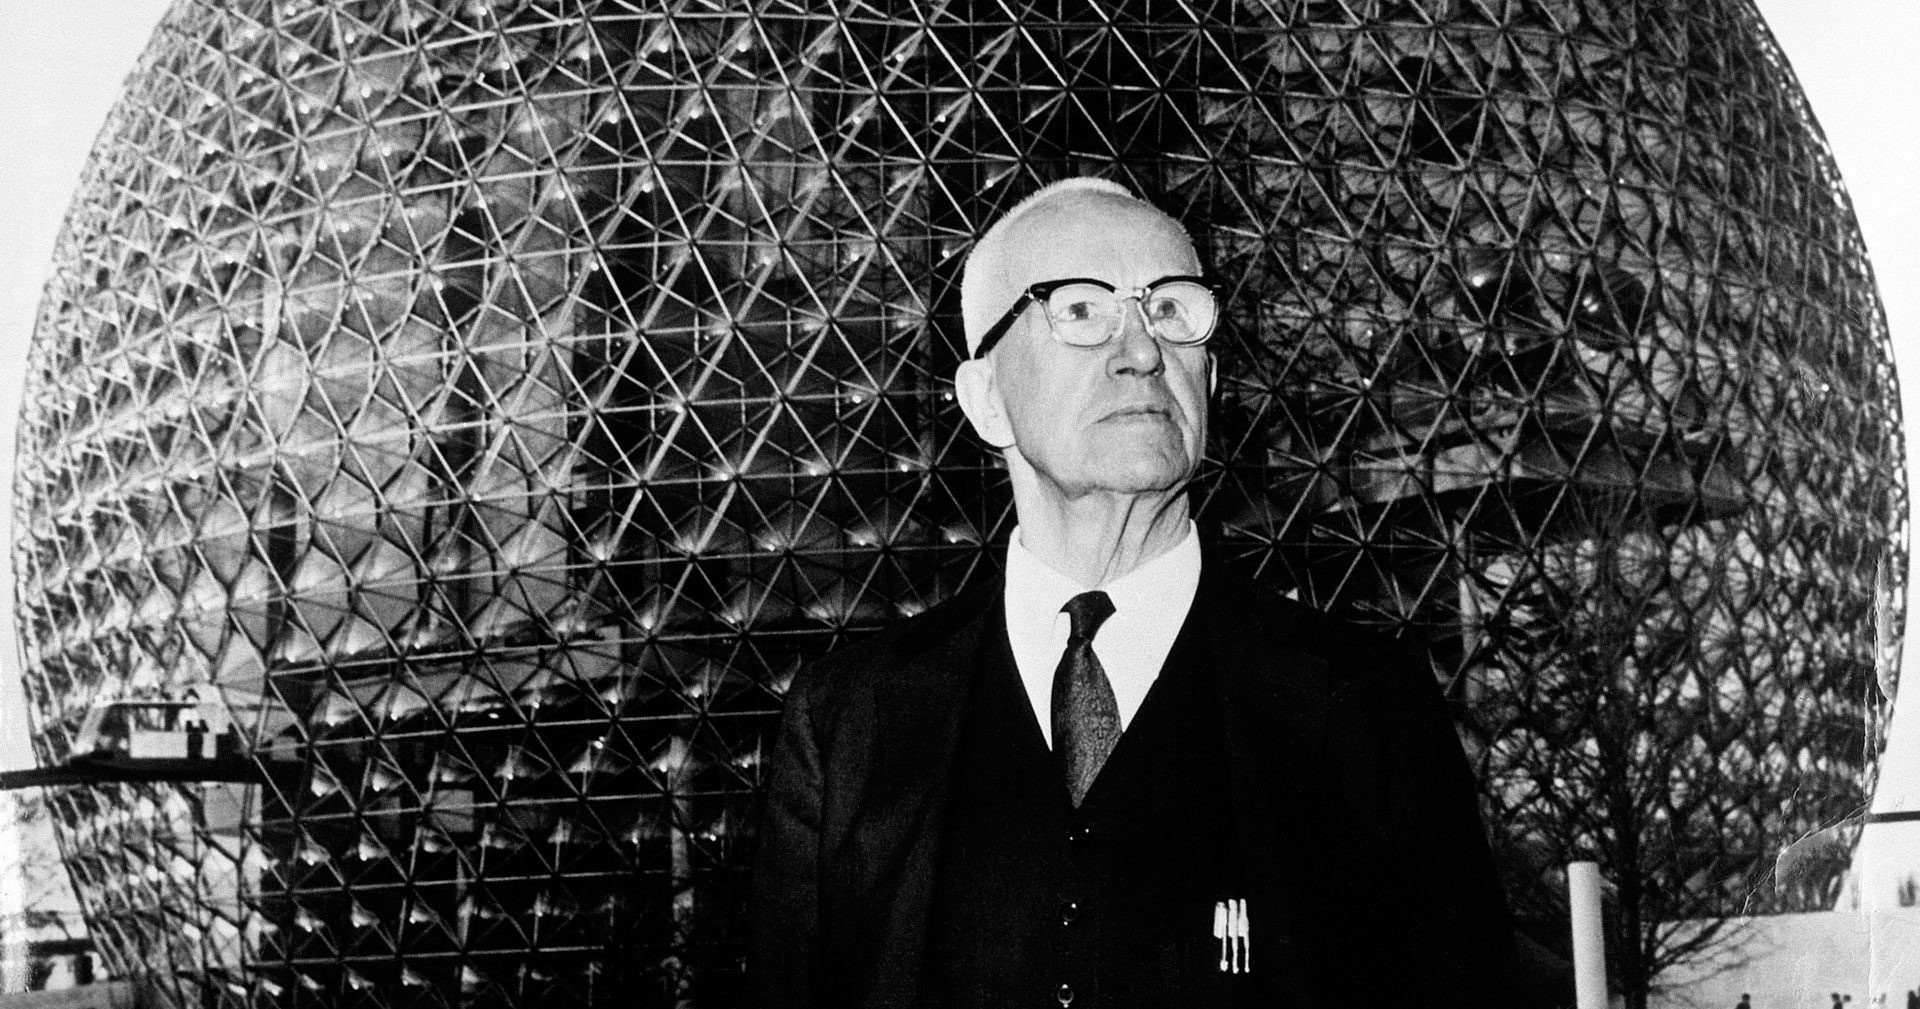 Buckminster_Fuller-BE043654-1200x630-e1459190747793-erickimphotography